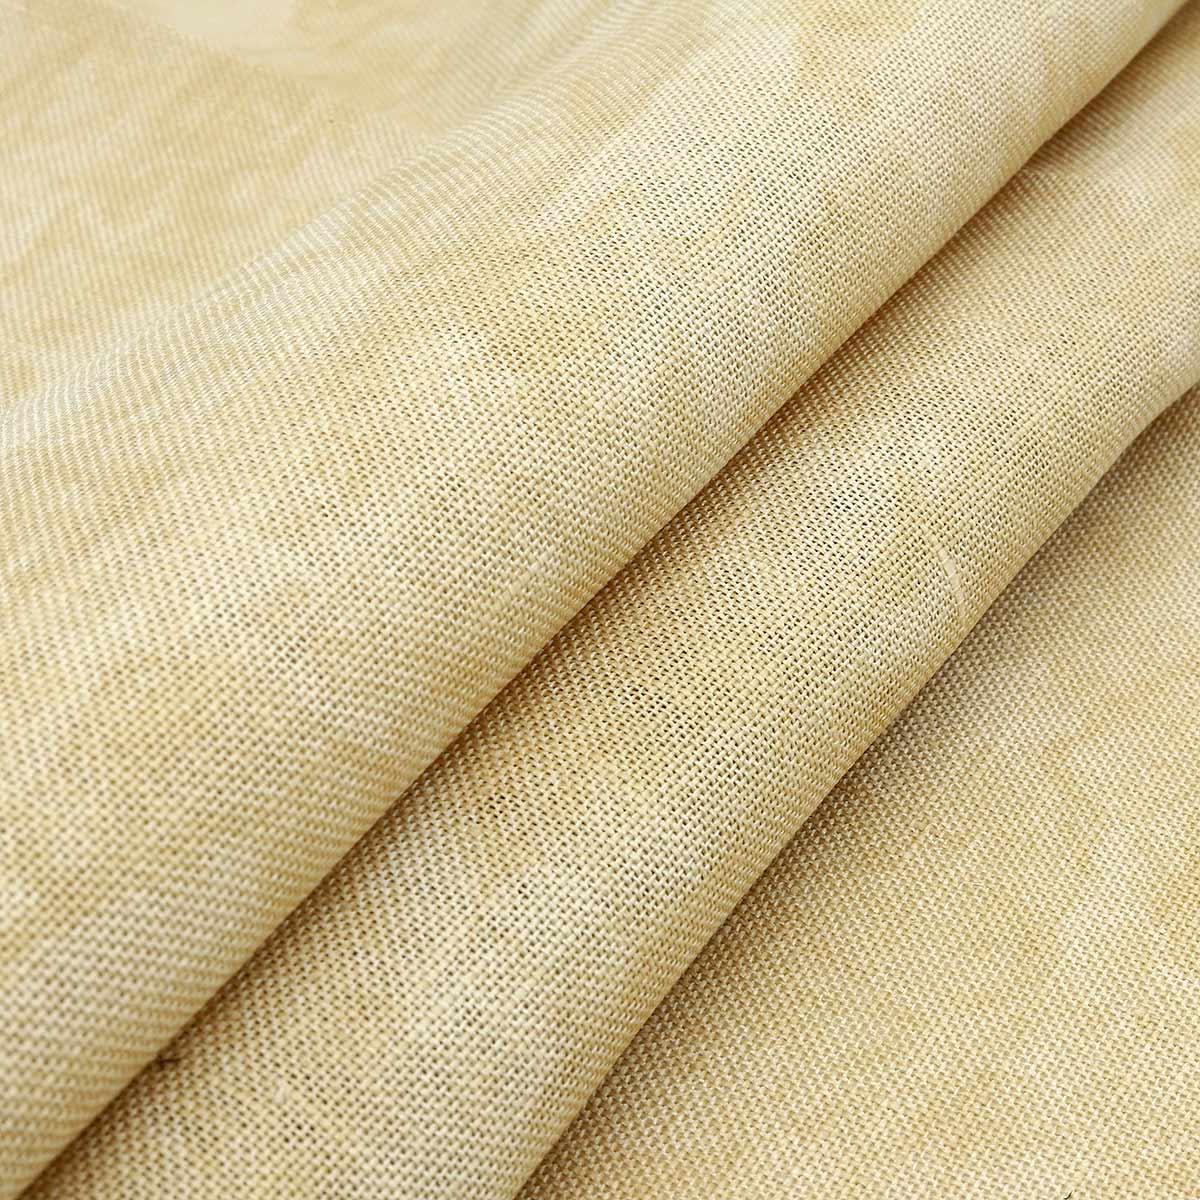 Канва в упаковке 3609/3009 Vintage Belfast Linen 32ct (100% лен) 50х70см